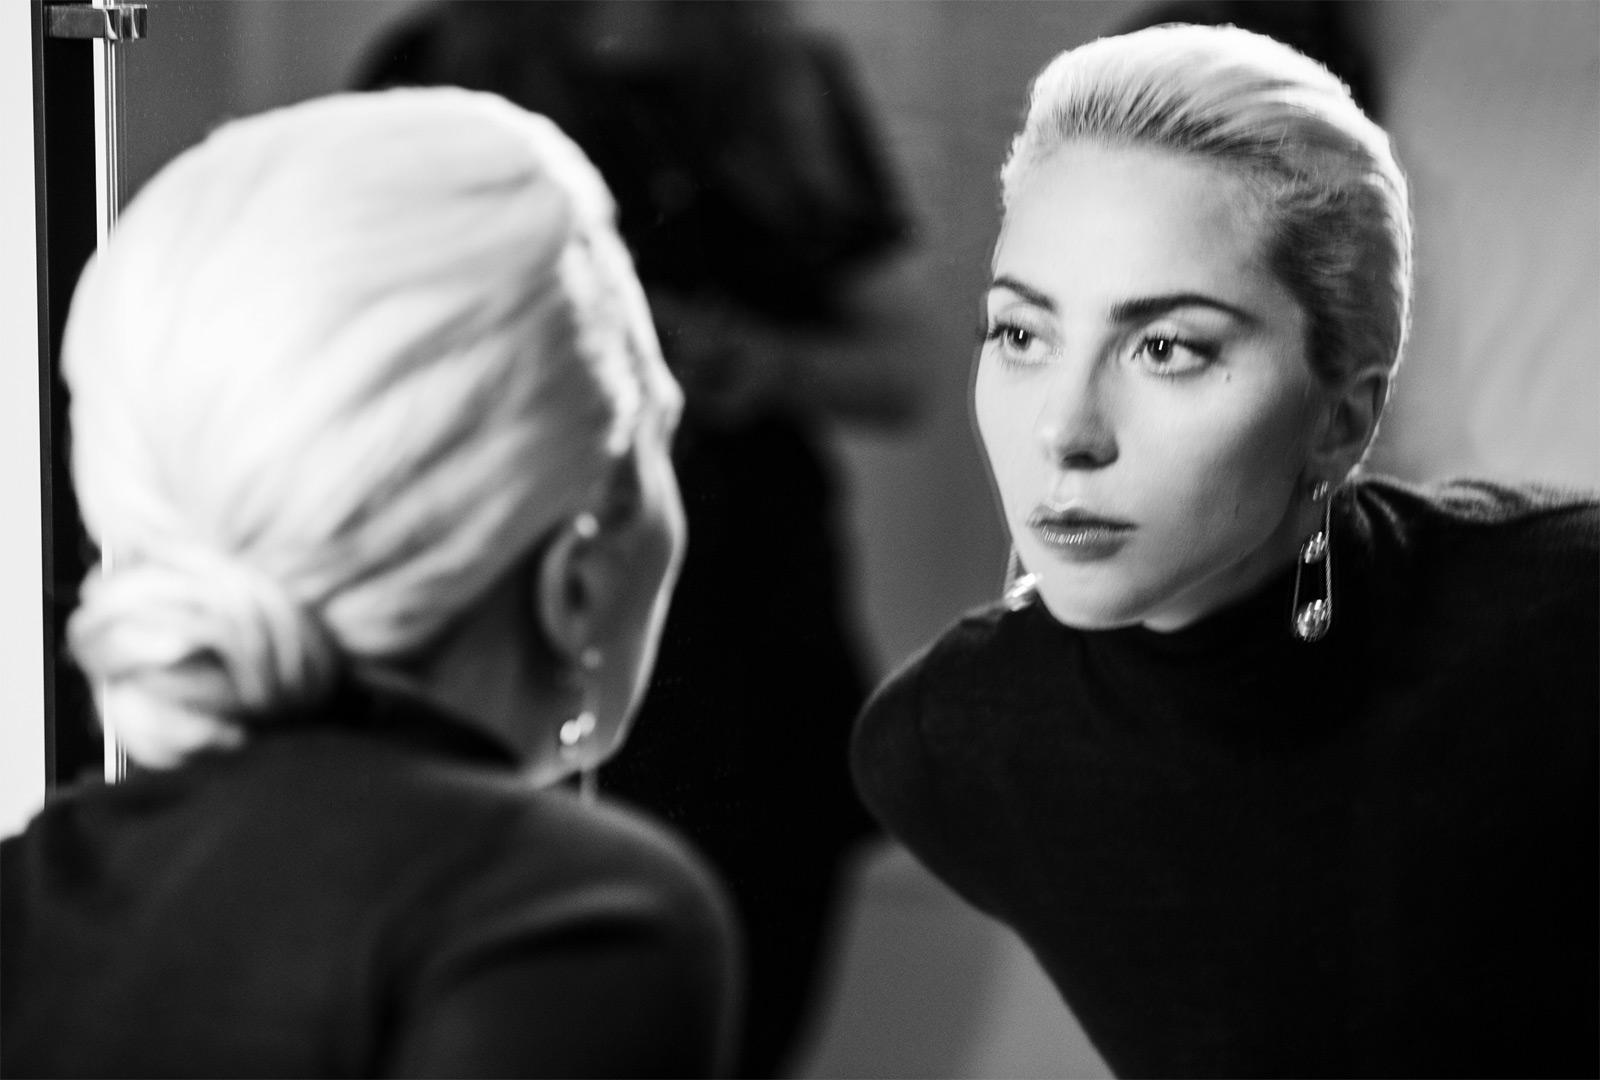 Stefani Joanne Angelina Germanotta aka Lady Gaga